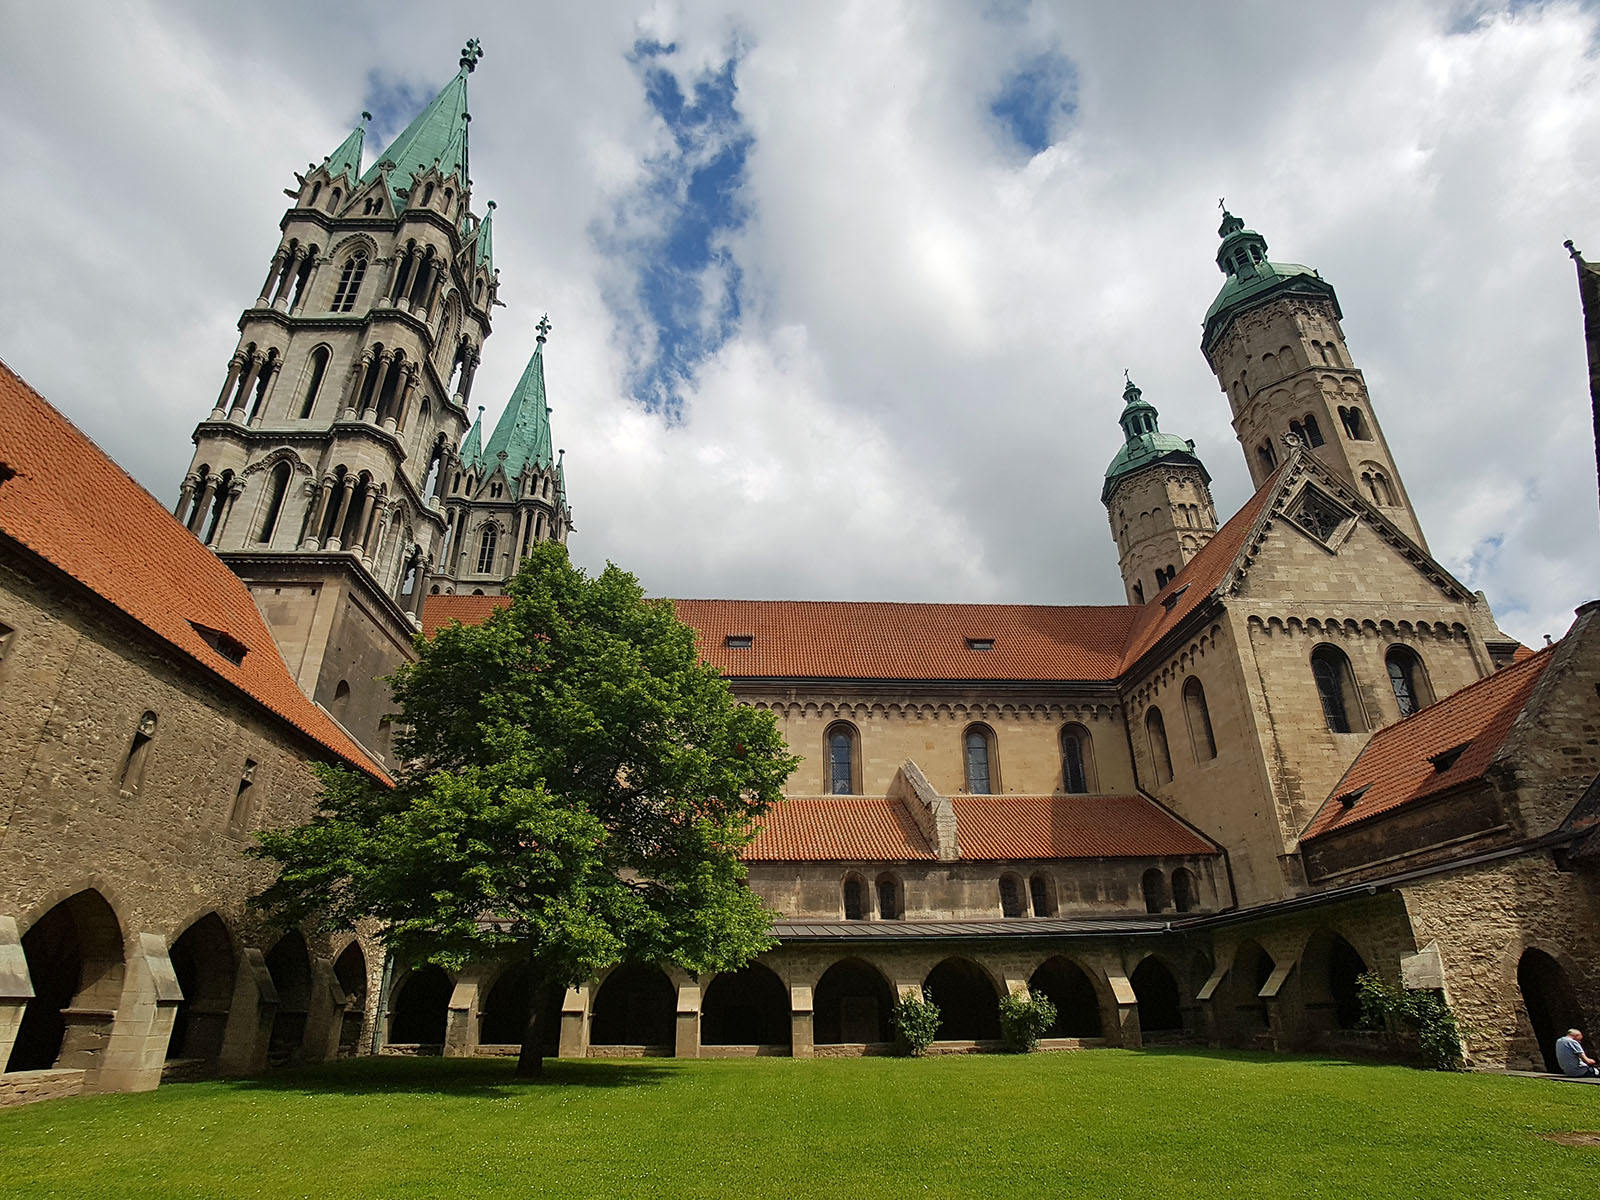 Dom zu Merseburg